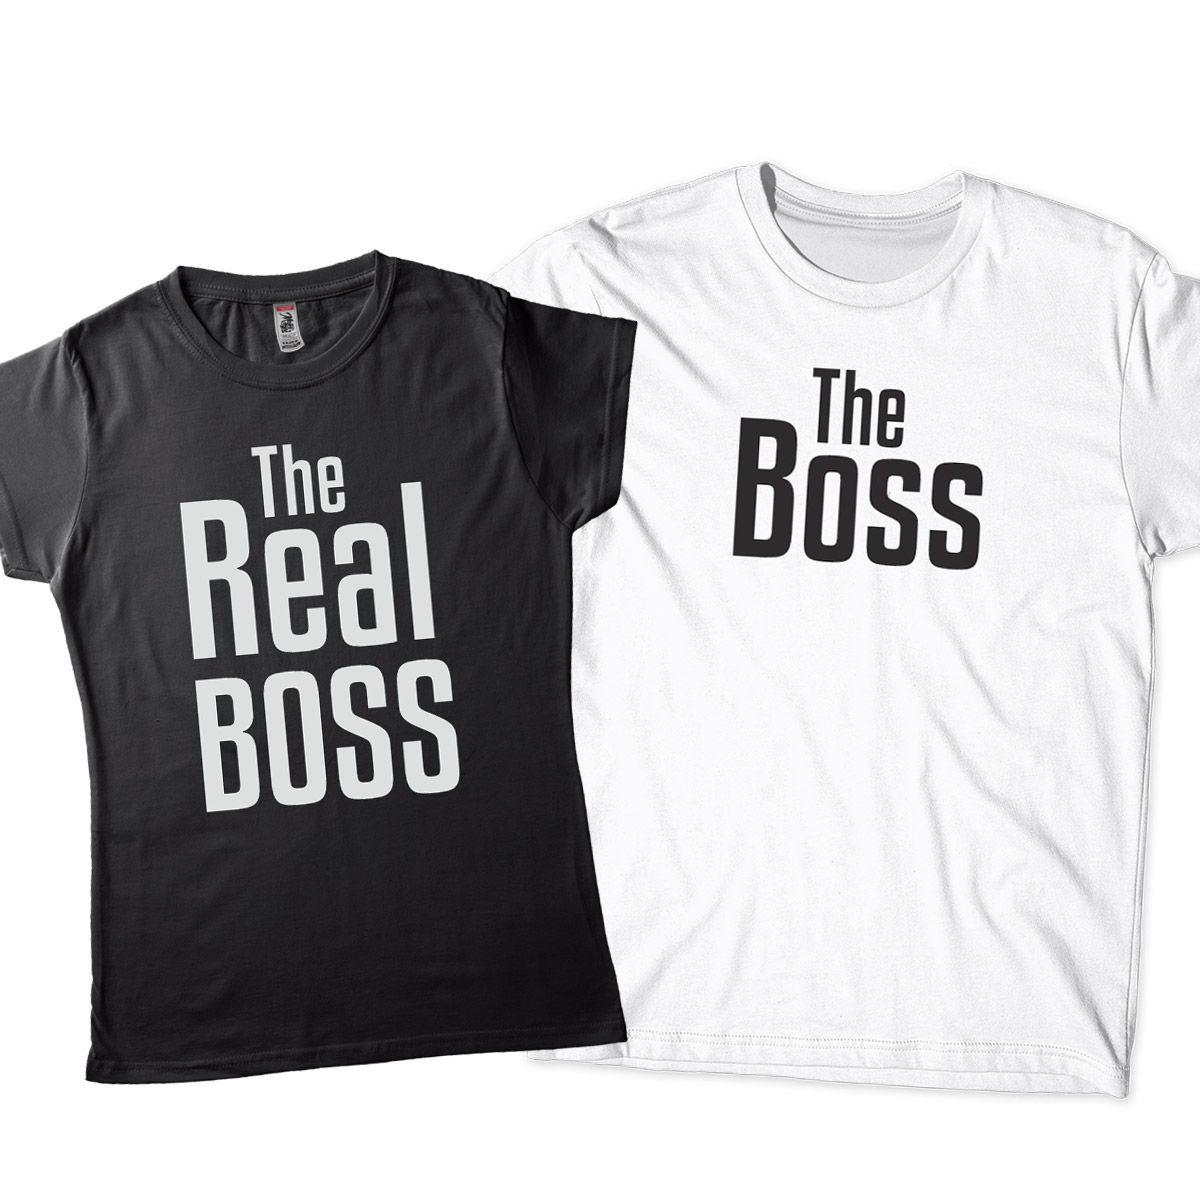 kit camisetas para namorados usarem juntos Real boss